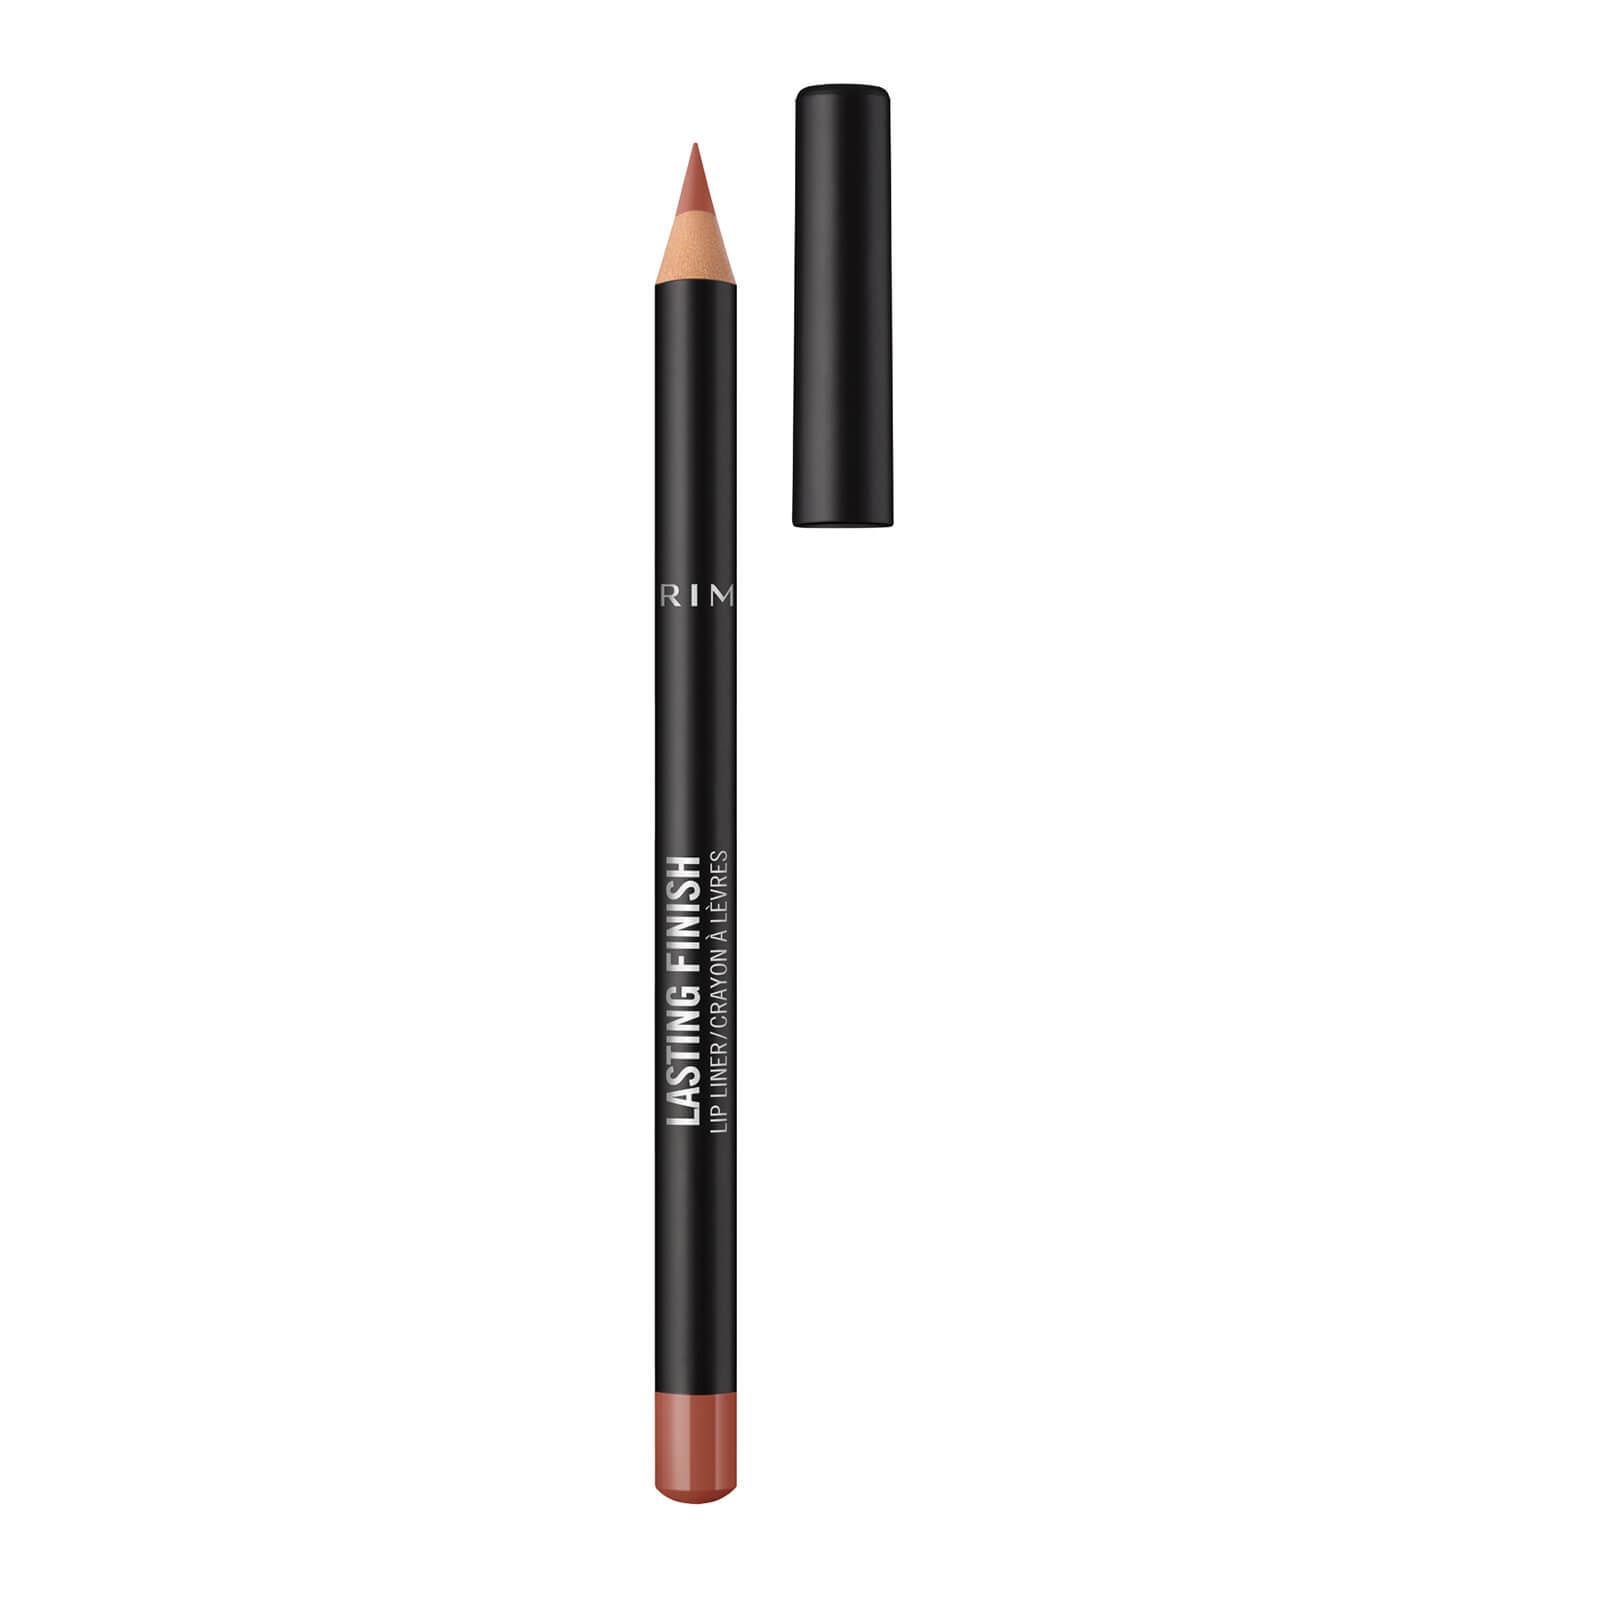 Купить Rimmel Lasting Finish 8HR Lip Liner (Various Shades) - Tiramisu 725